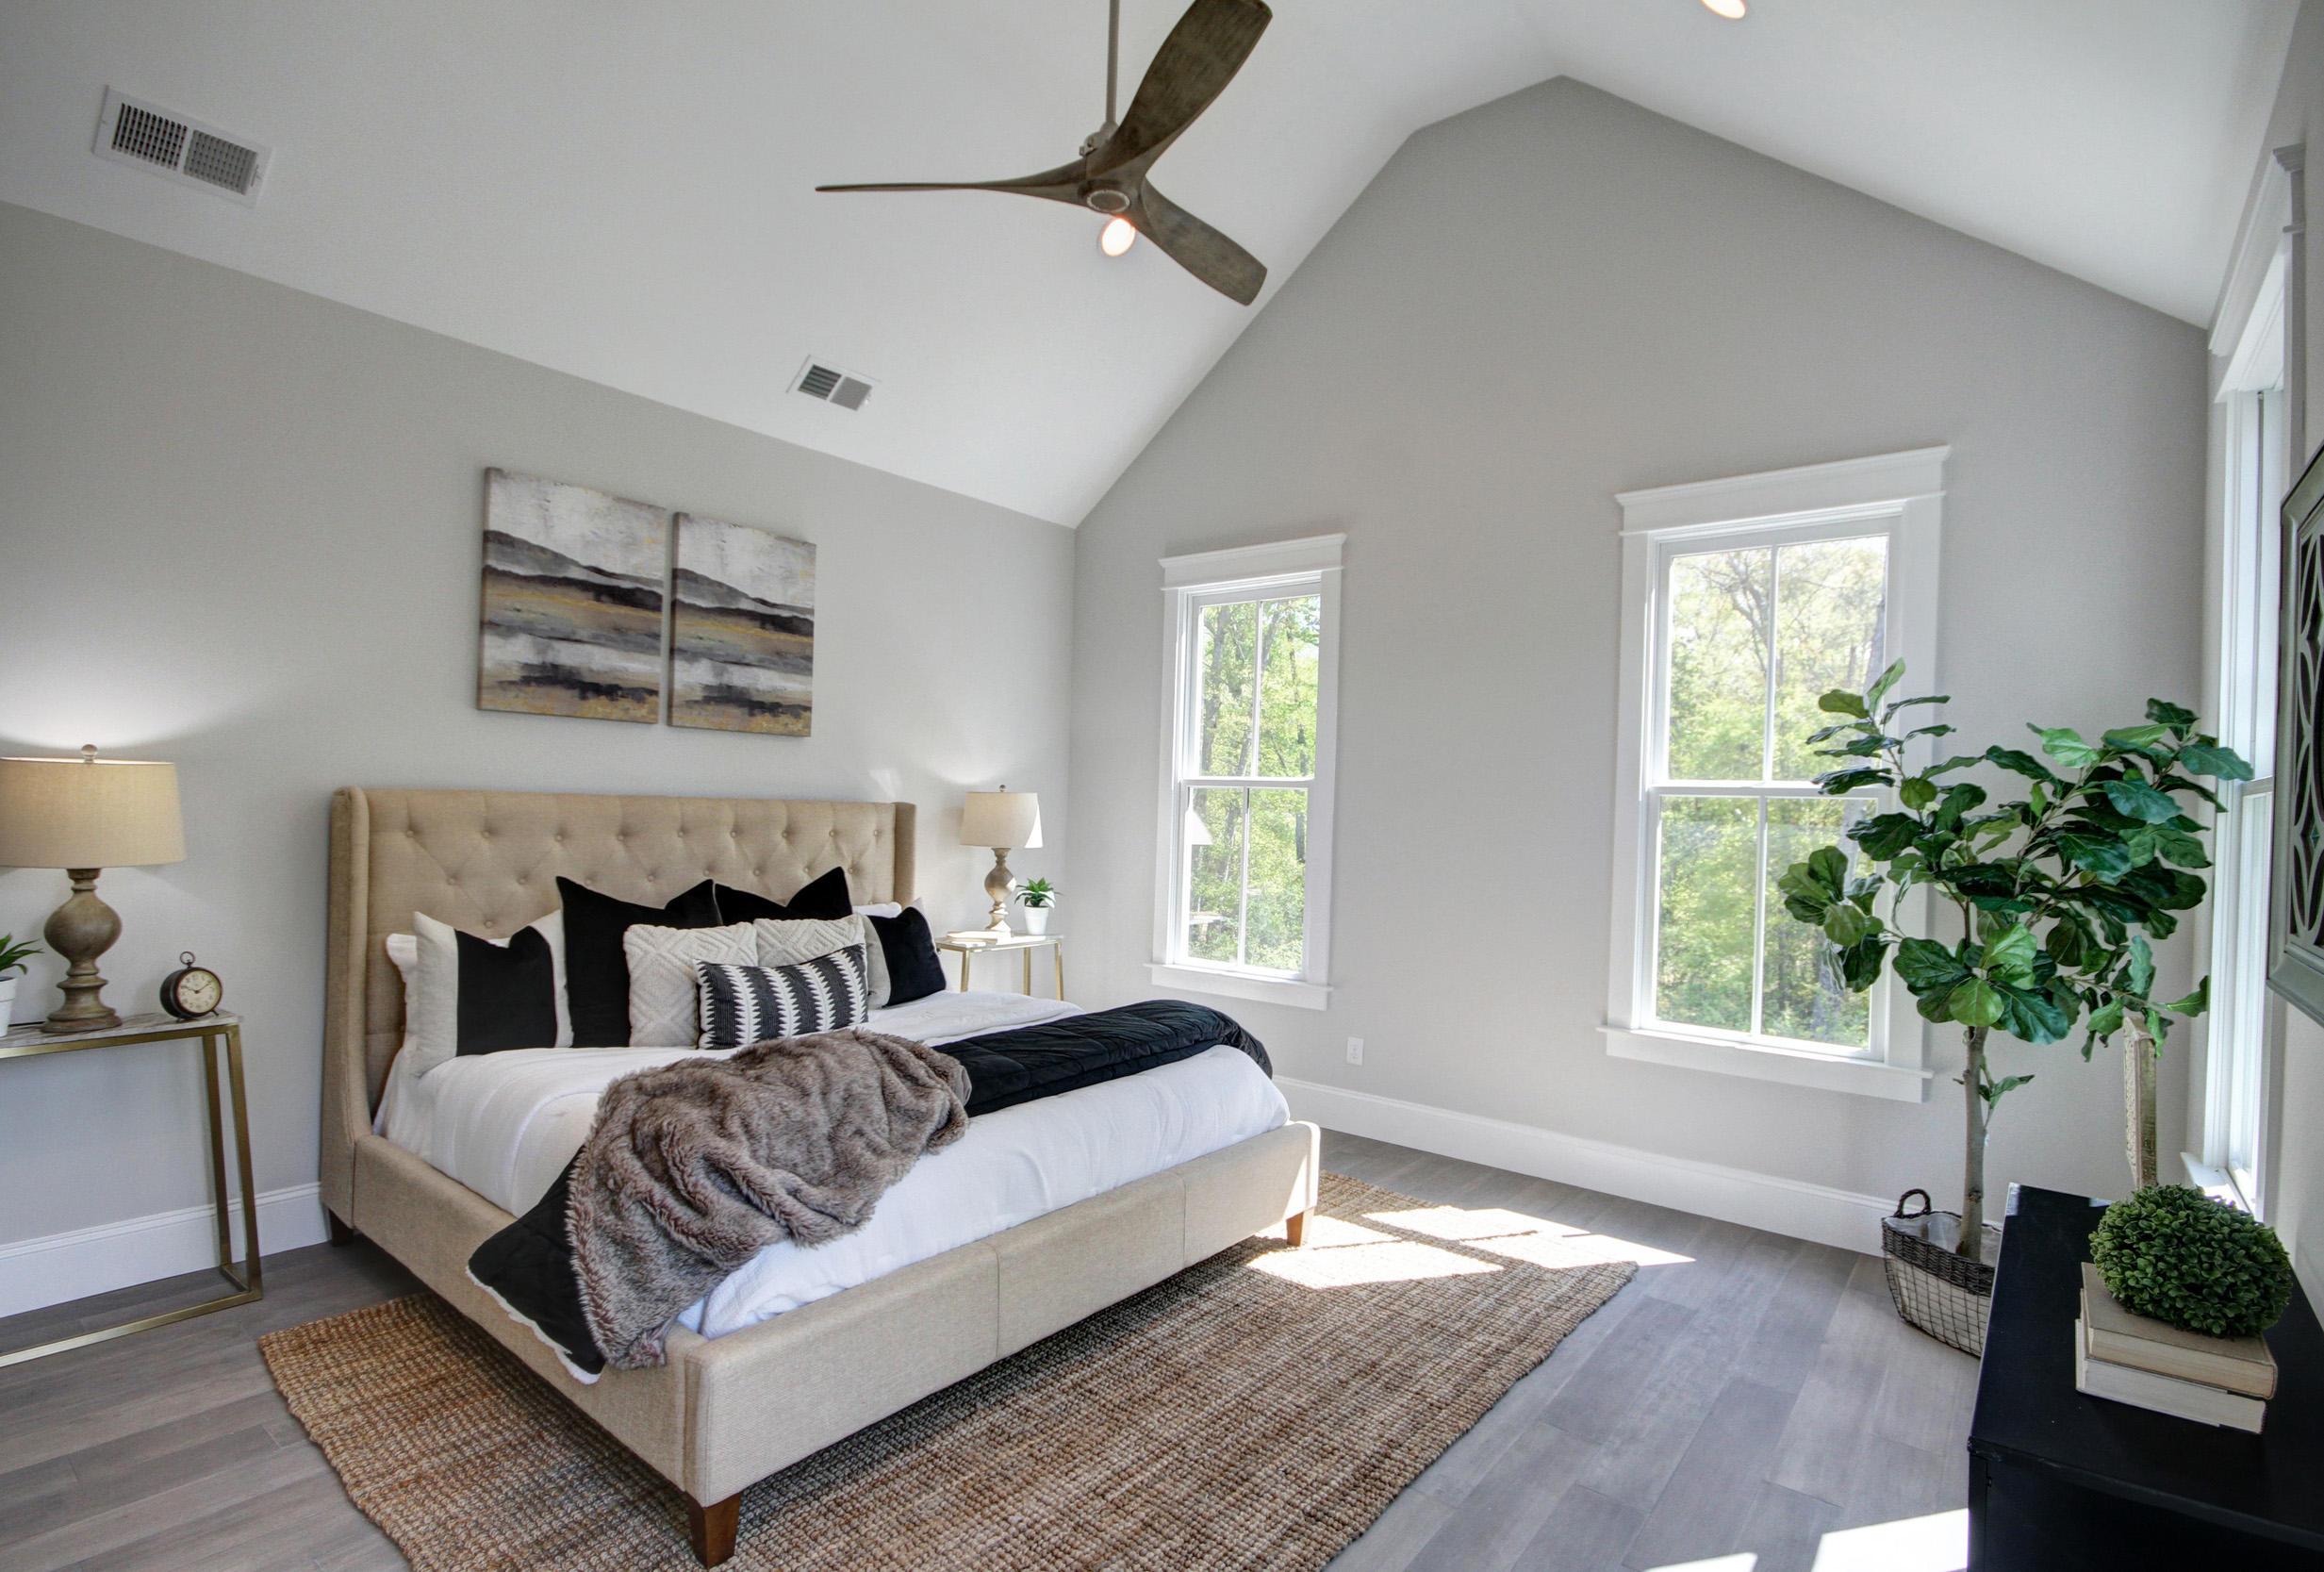 Mathis Ferry Court Homes For Sale - 1212 Clonmel Place, Mount Pleasant, SC - 8